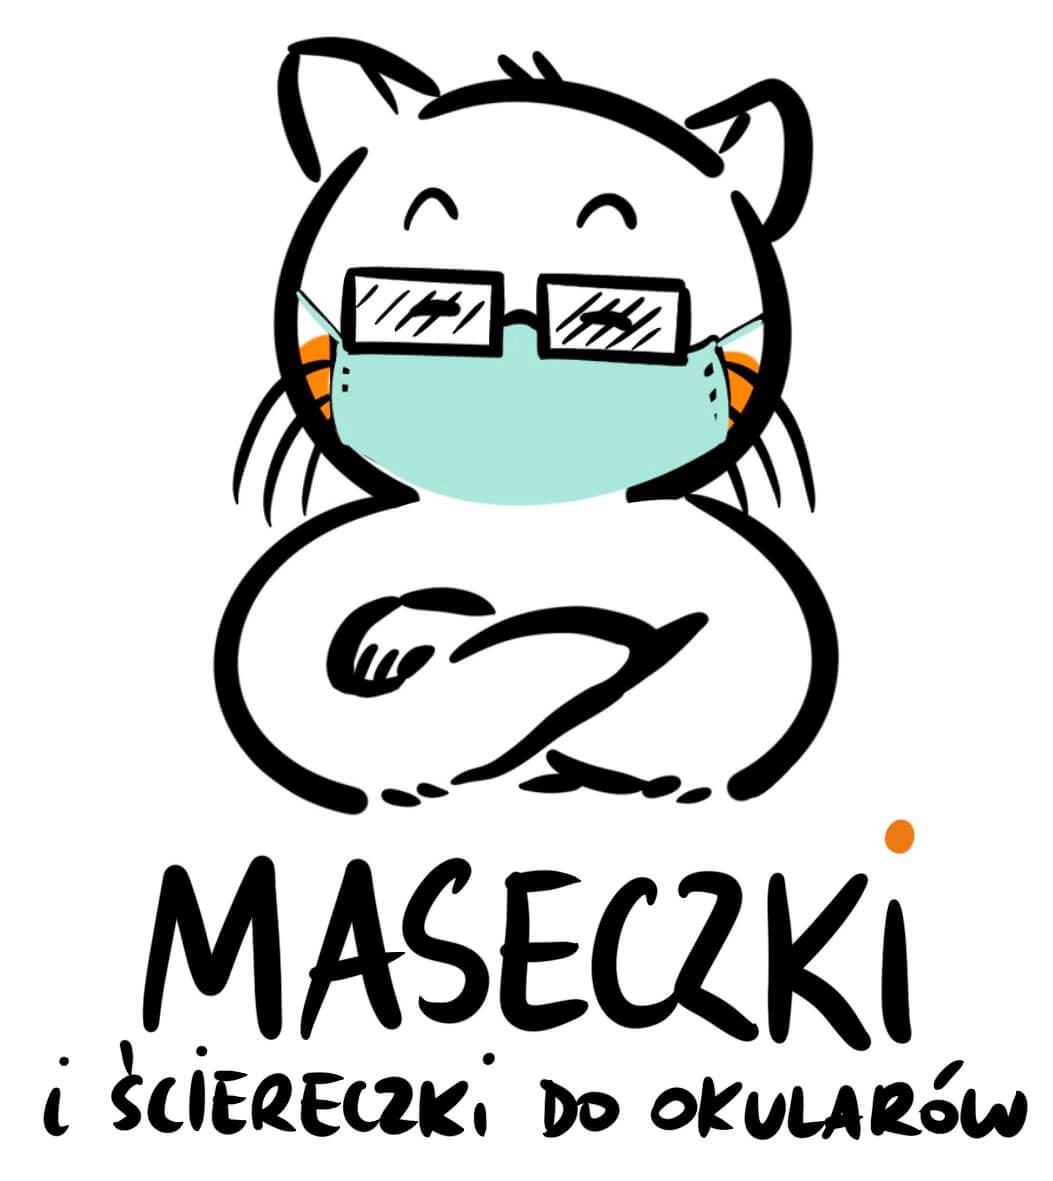 maseczki_1.png